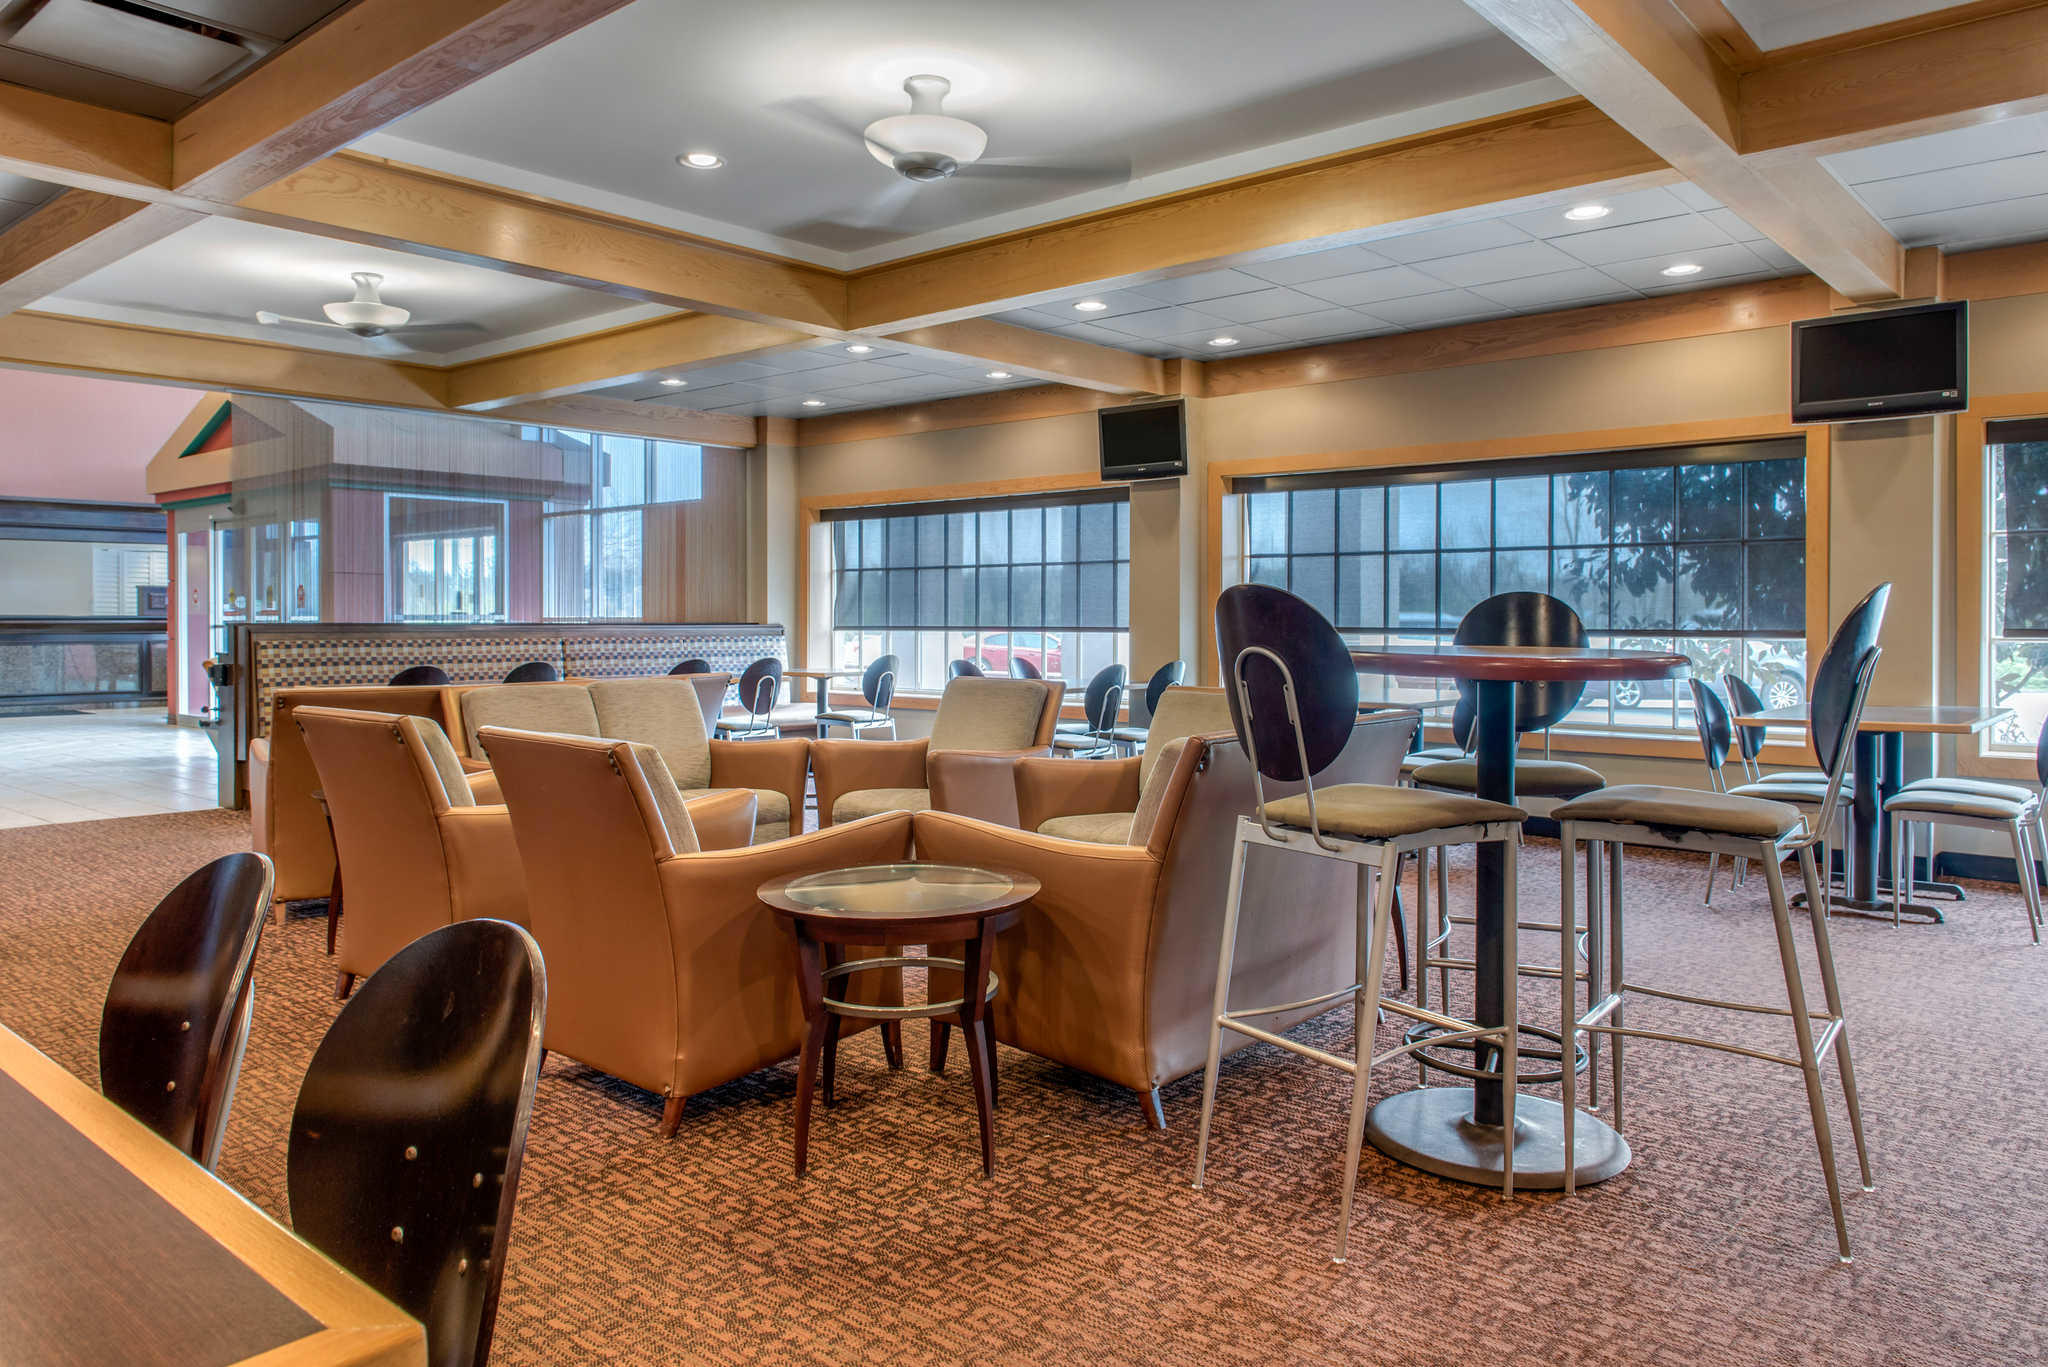 Quality Hotel - Cincinnati Blue Ash image 39